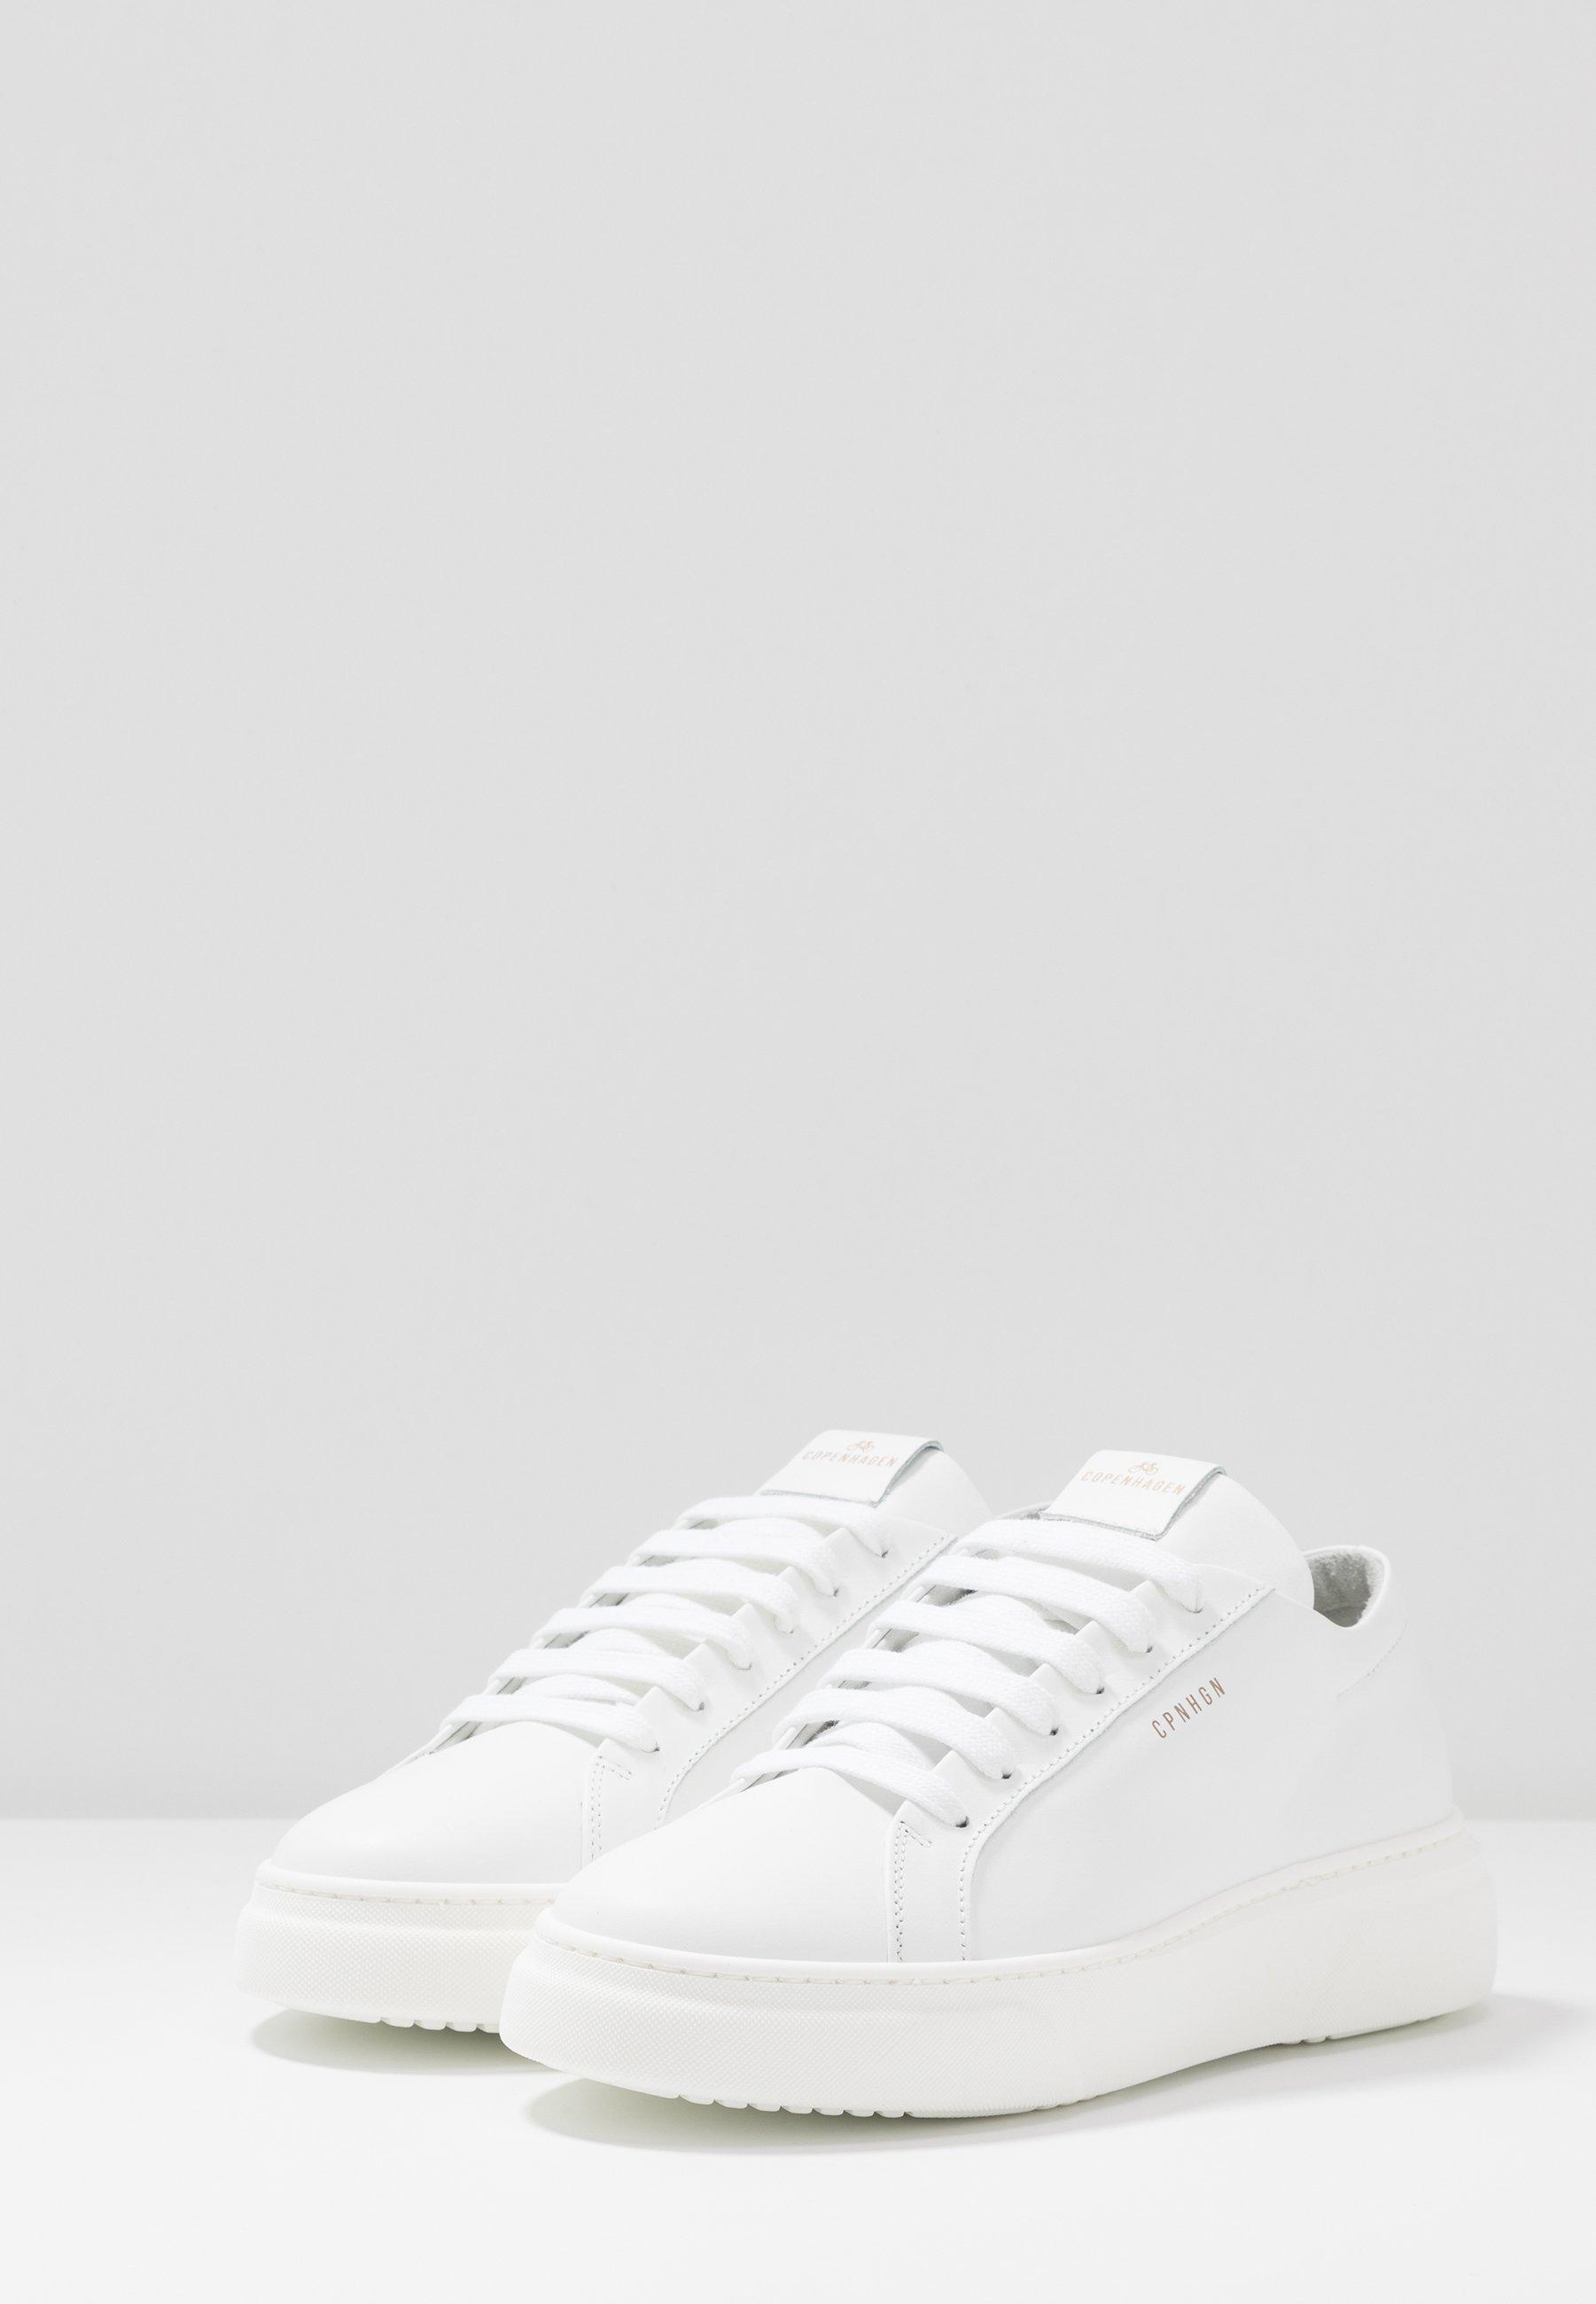 CPH307 Sneakers white